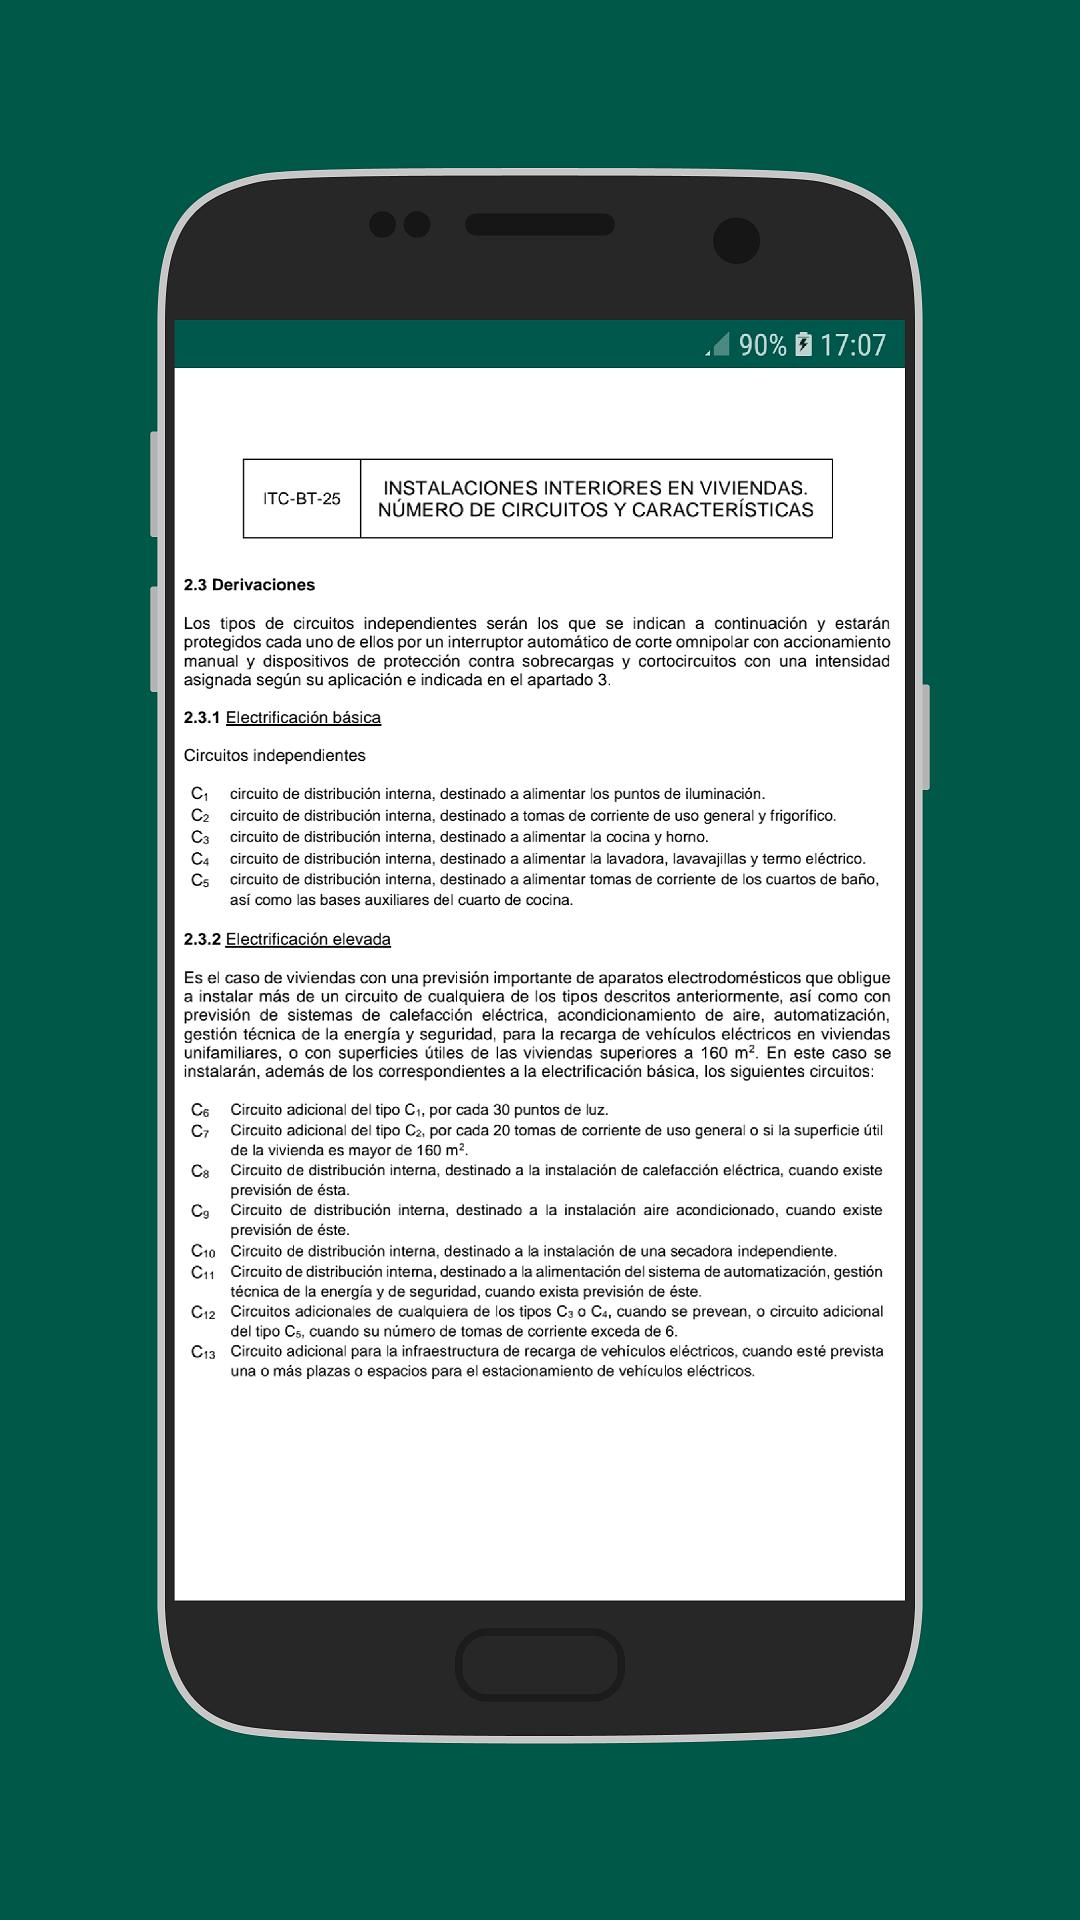 REBT Offline: Amazon.es: Appstore para Android